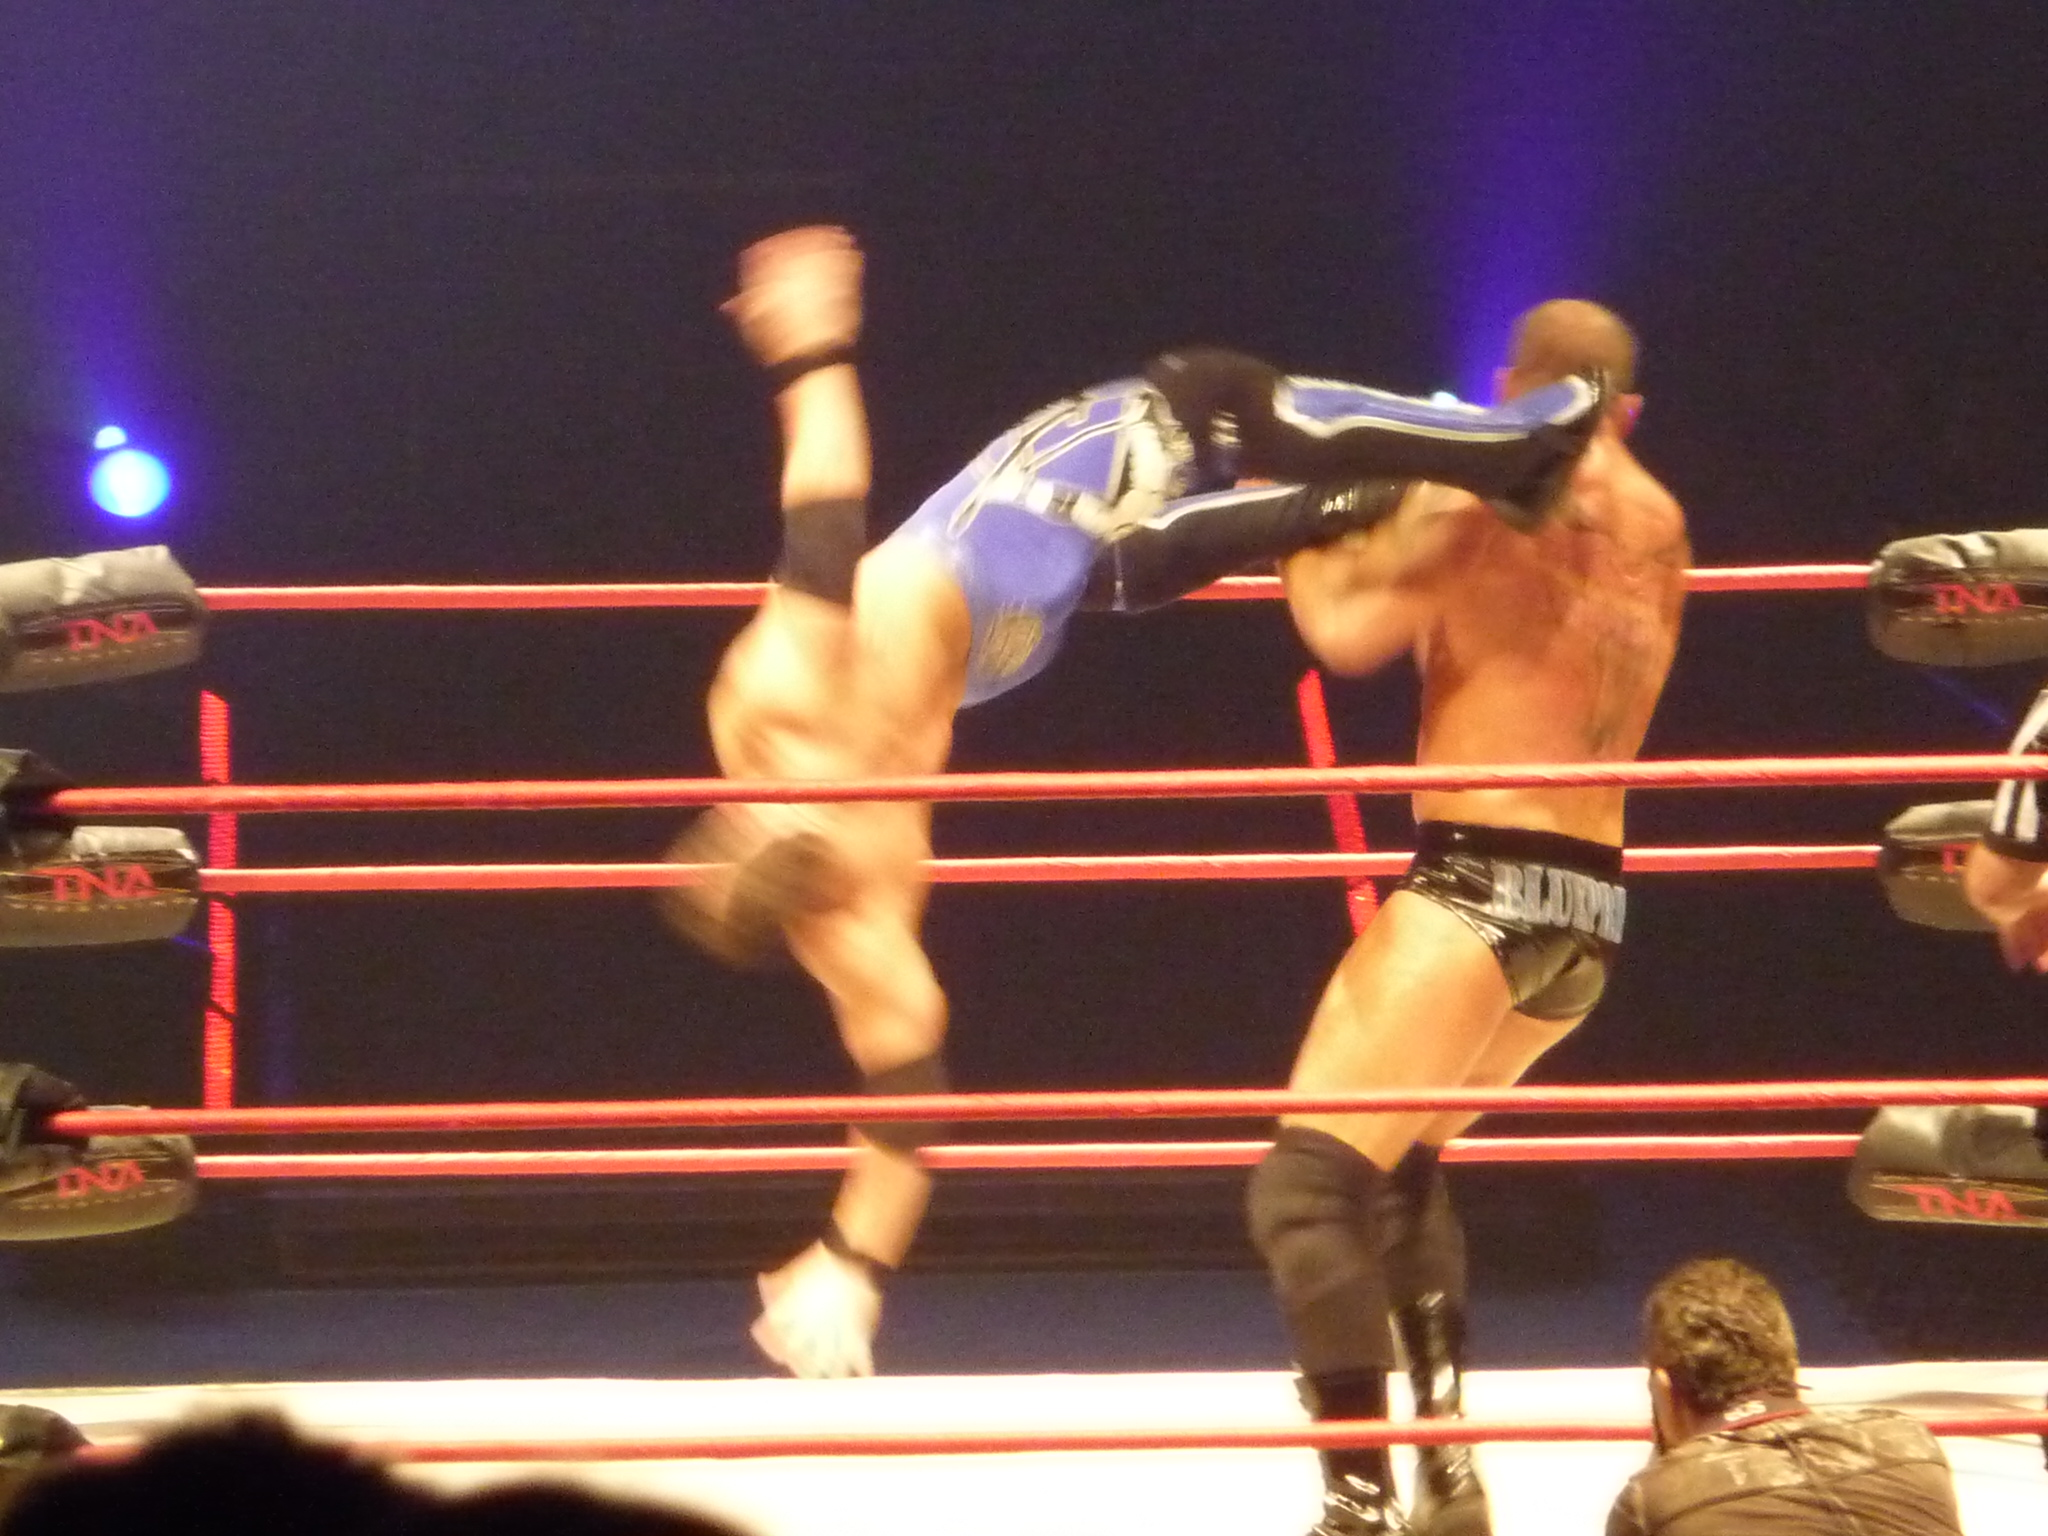 Styles performing a dropkick on Matt Morgan.